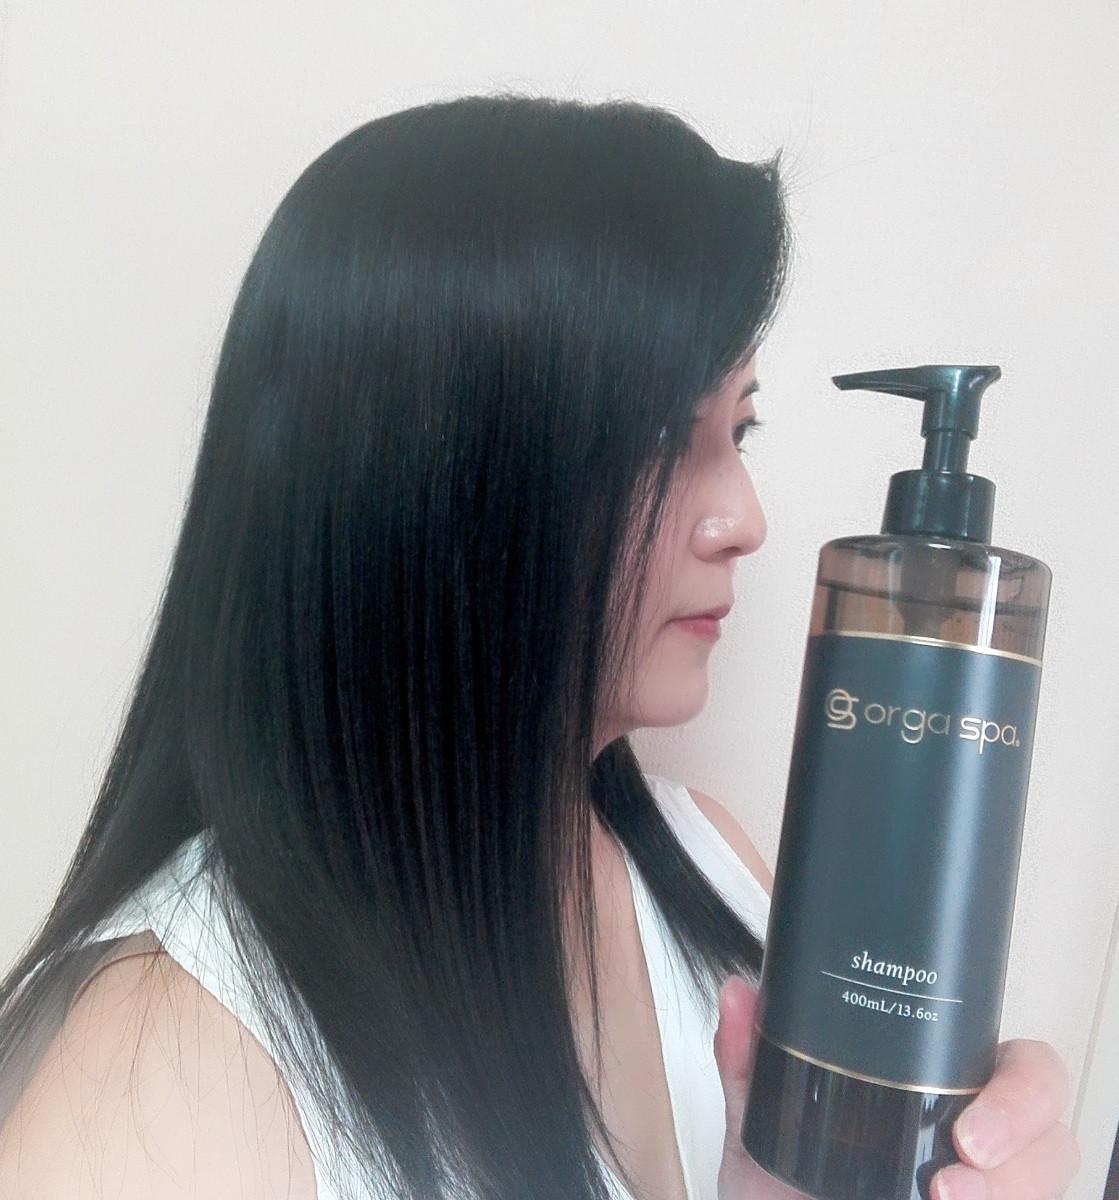 orga spa shampoo